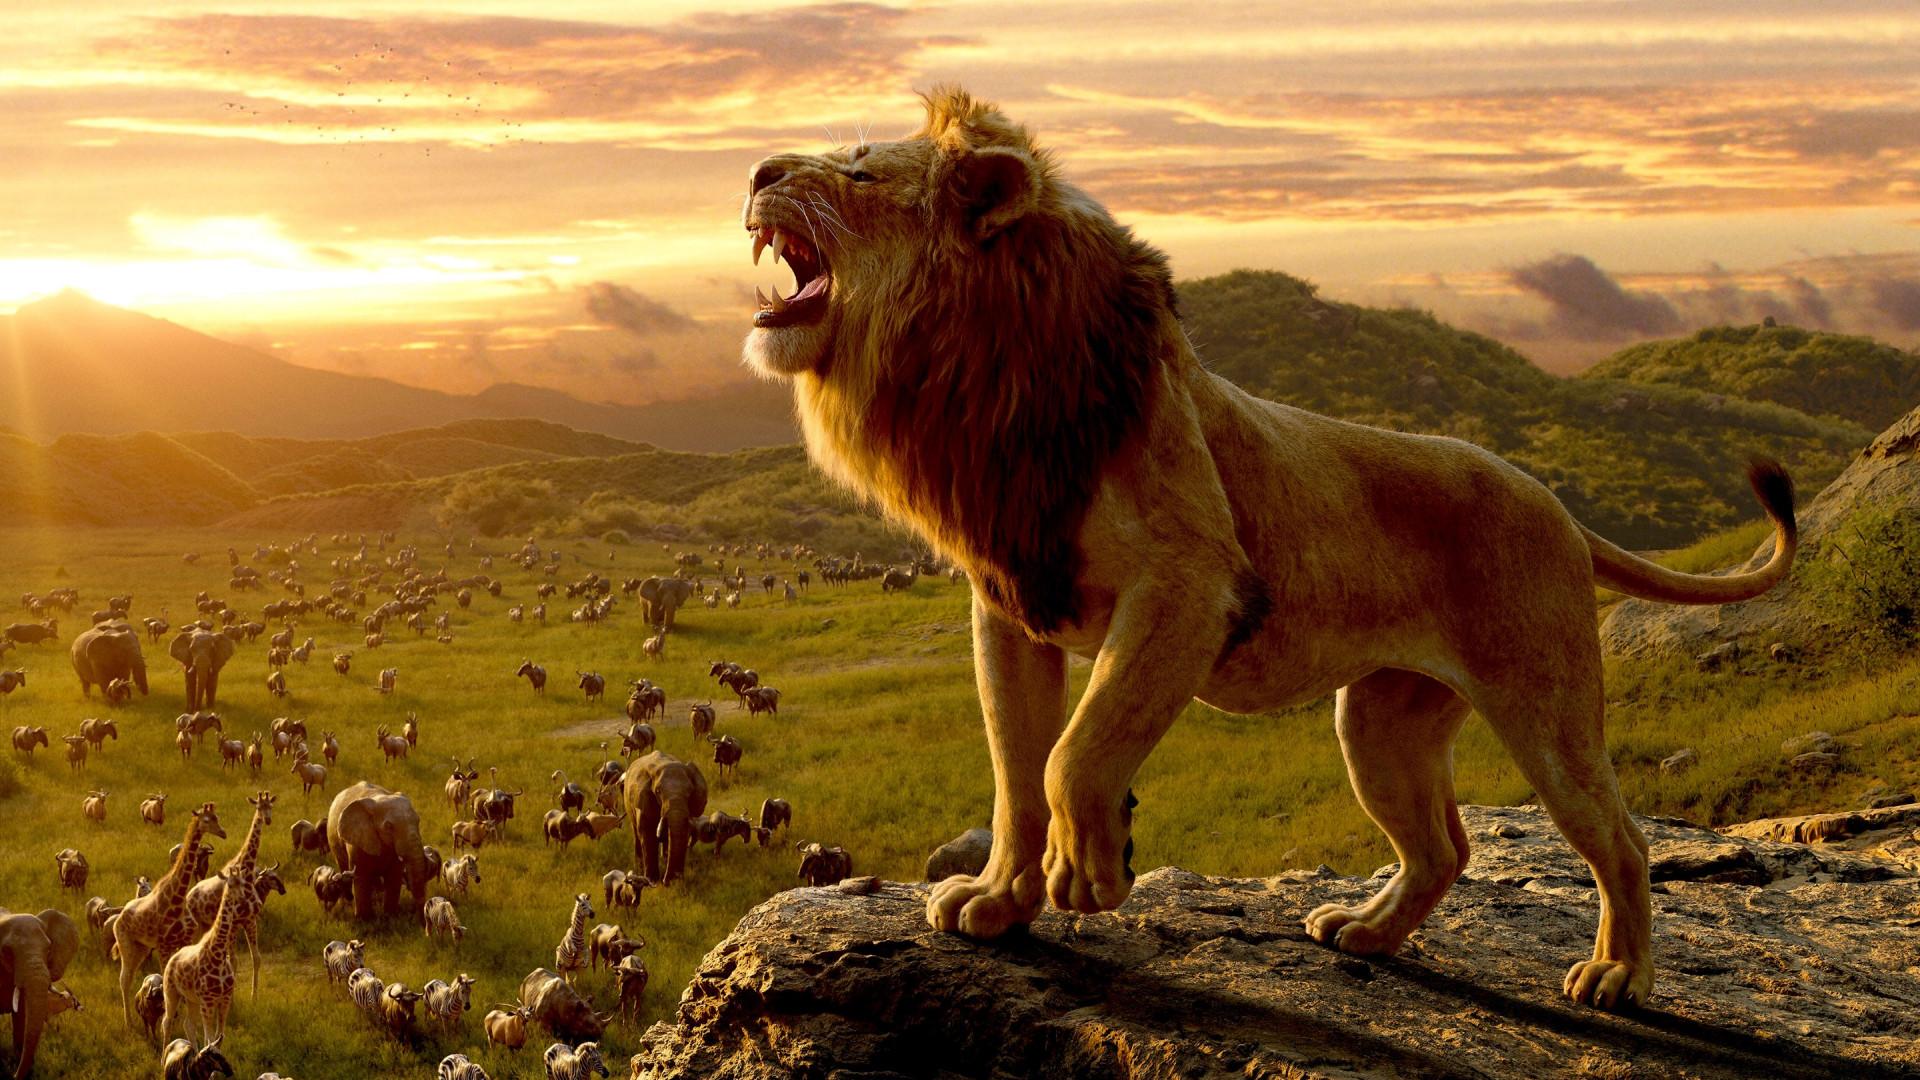 Download Wallpaper Simba The Lion King 1920x1080